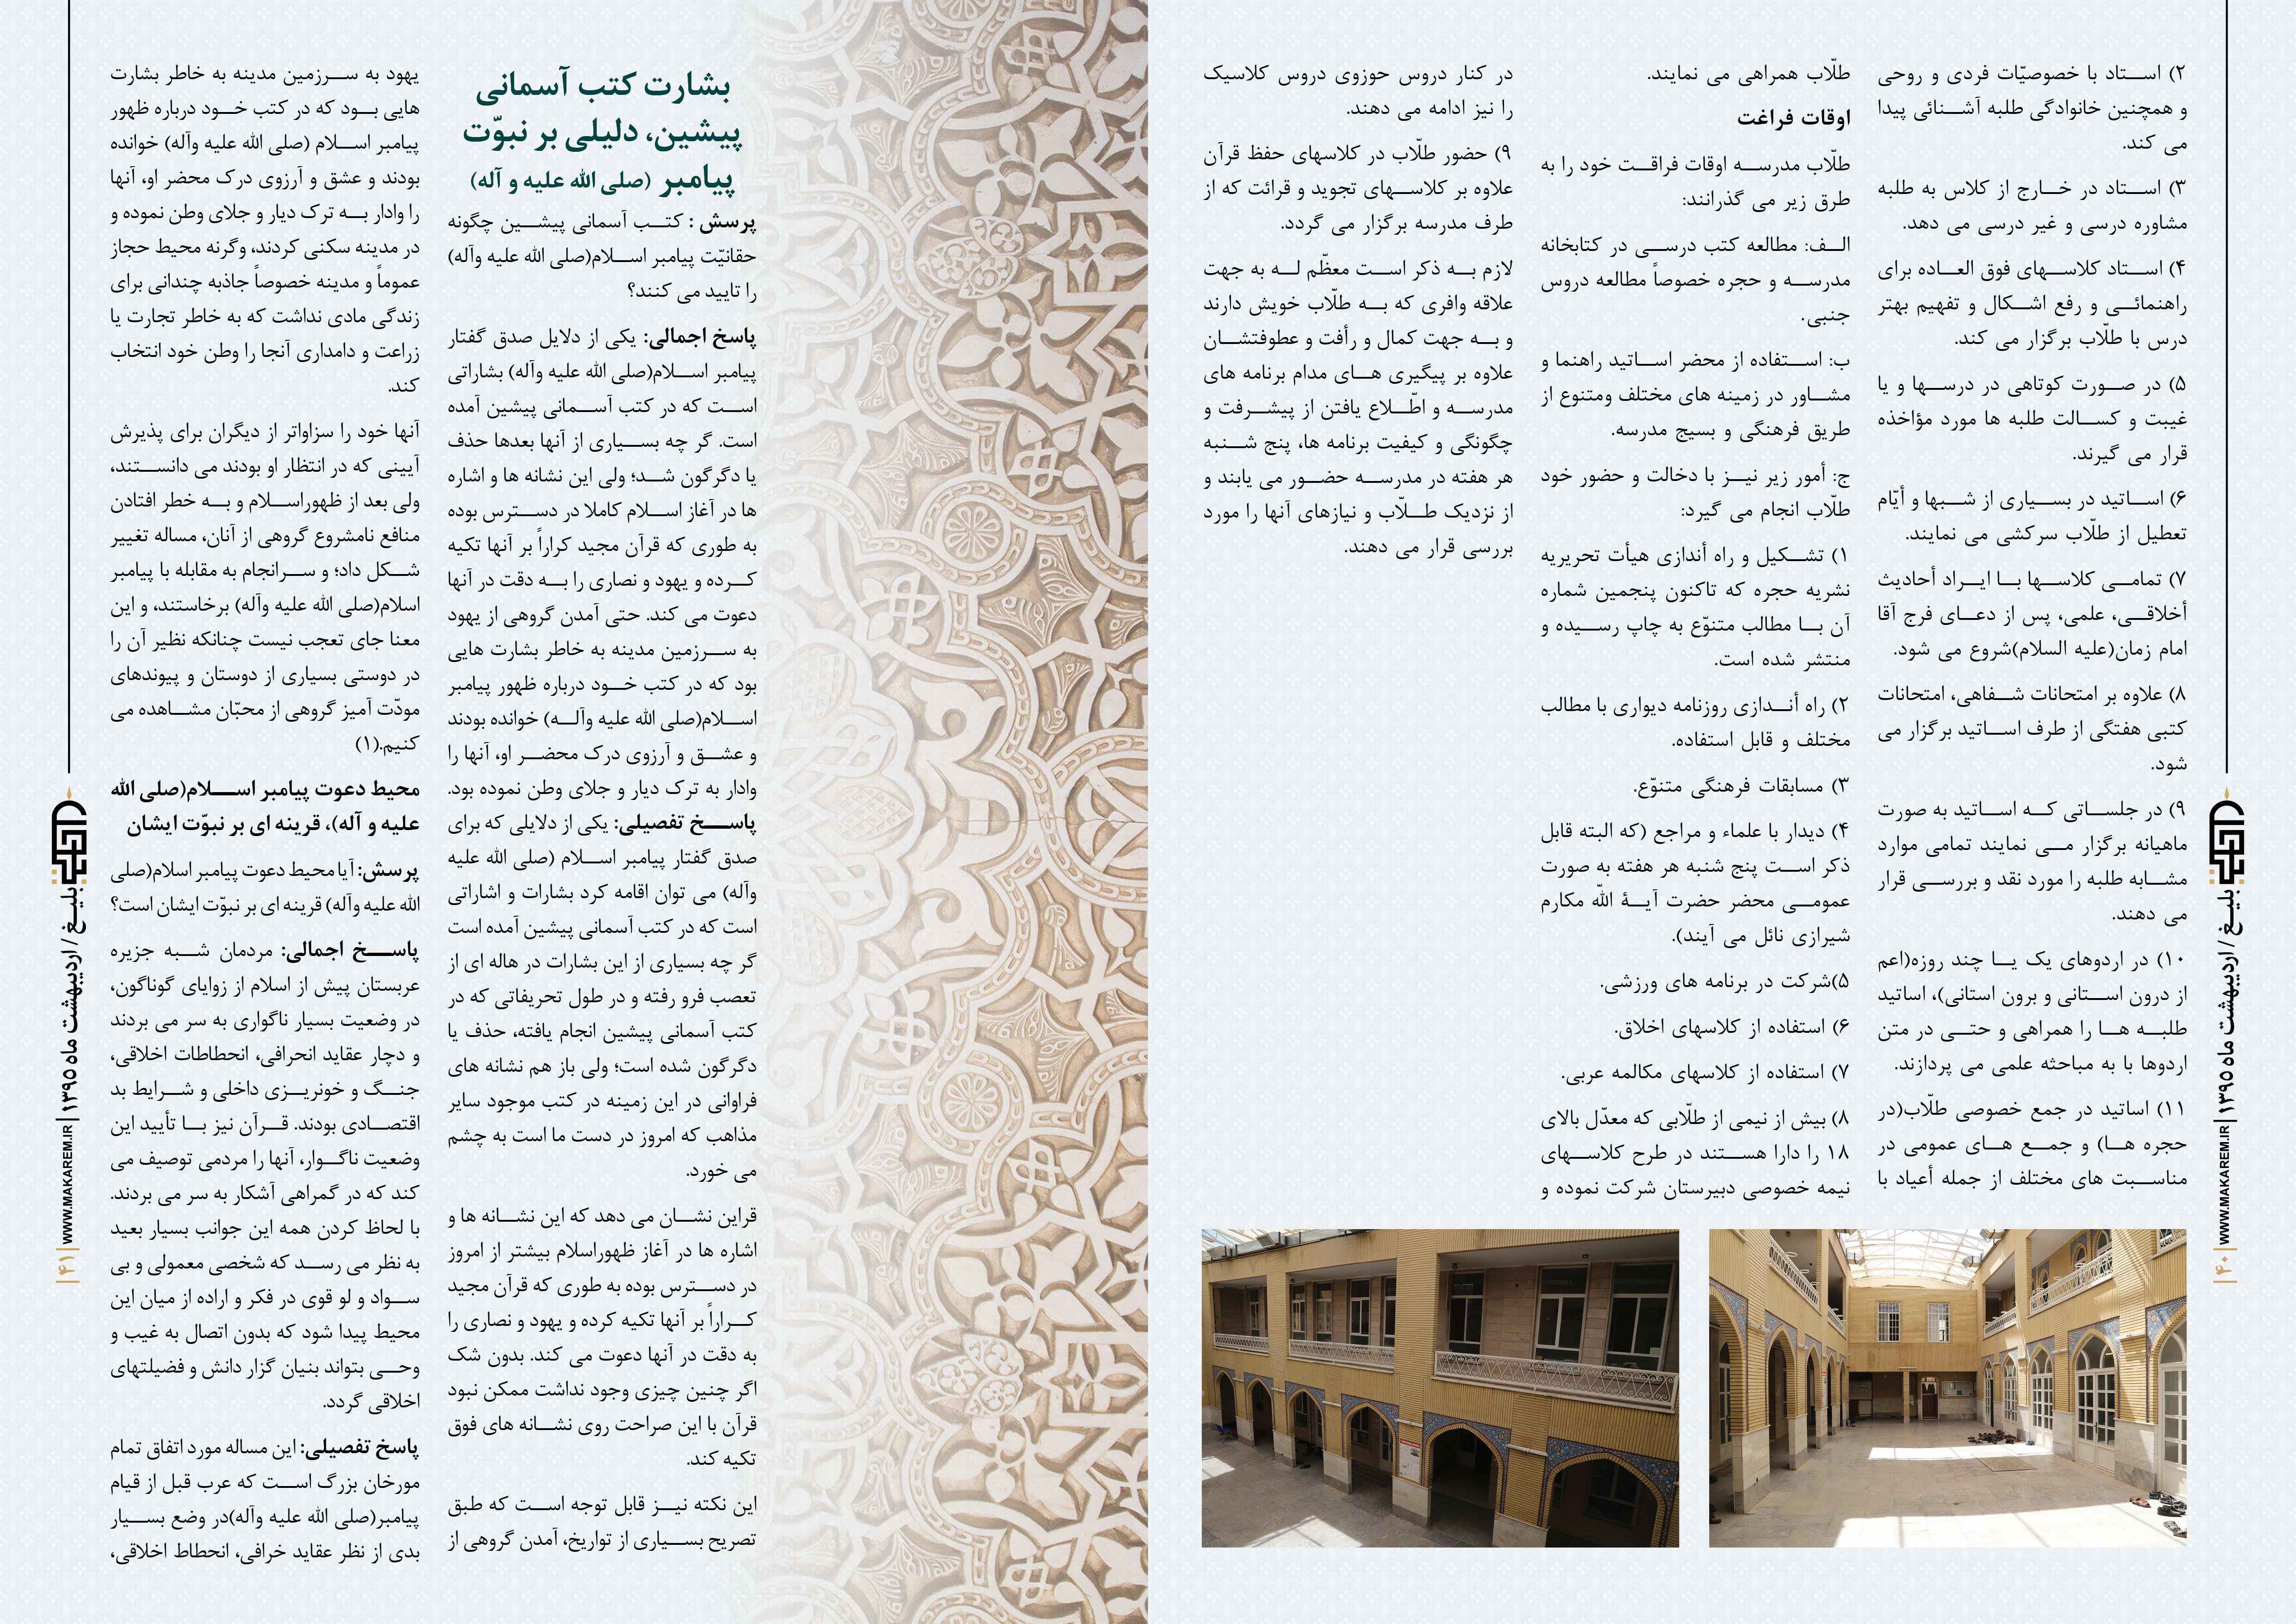 21-مدرسه الامام امیر المومنین (ع)